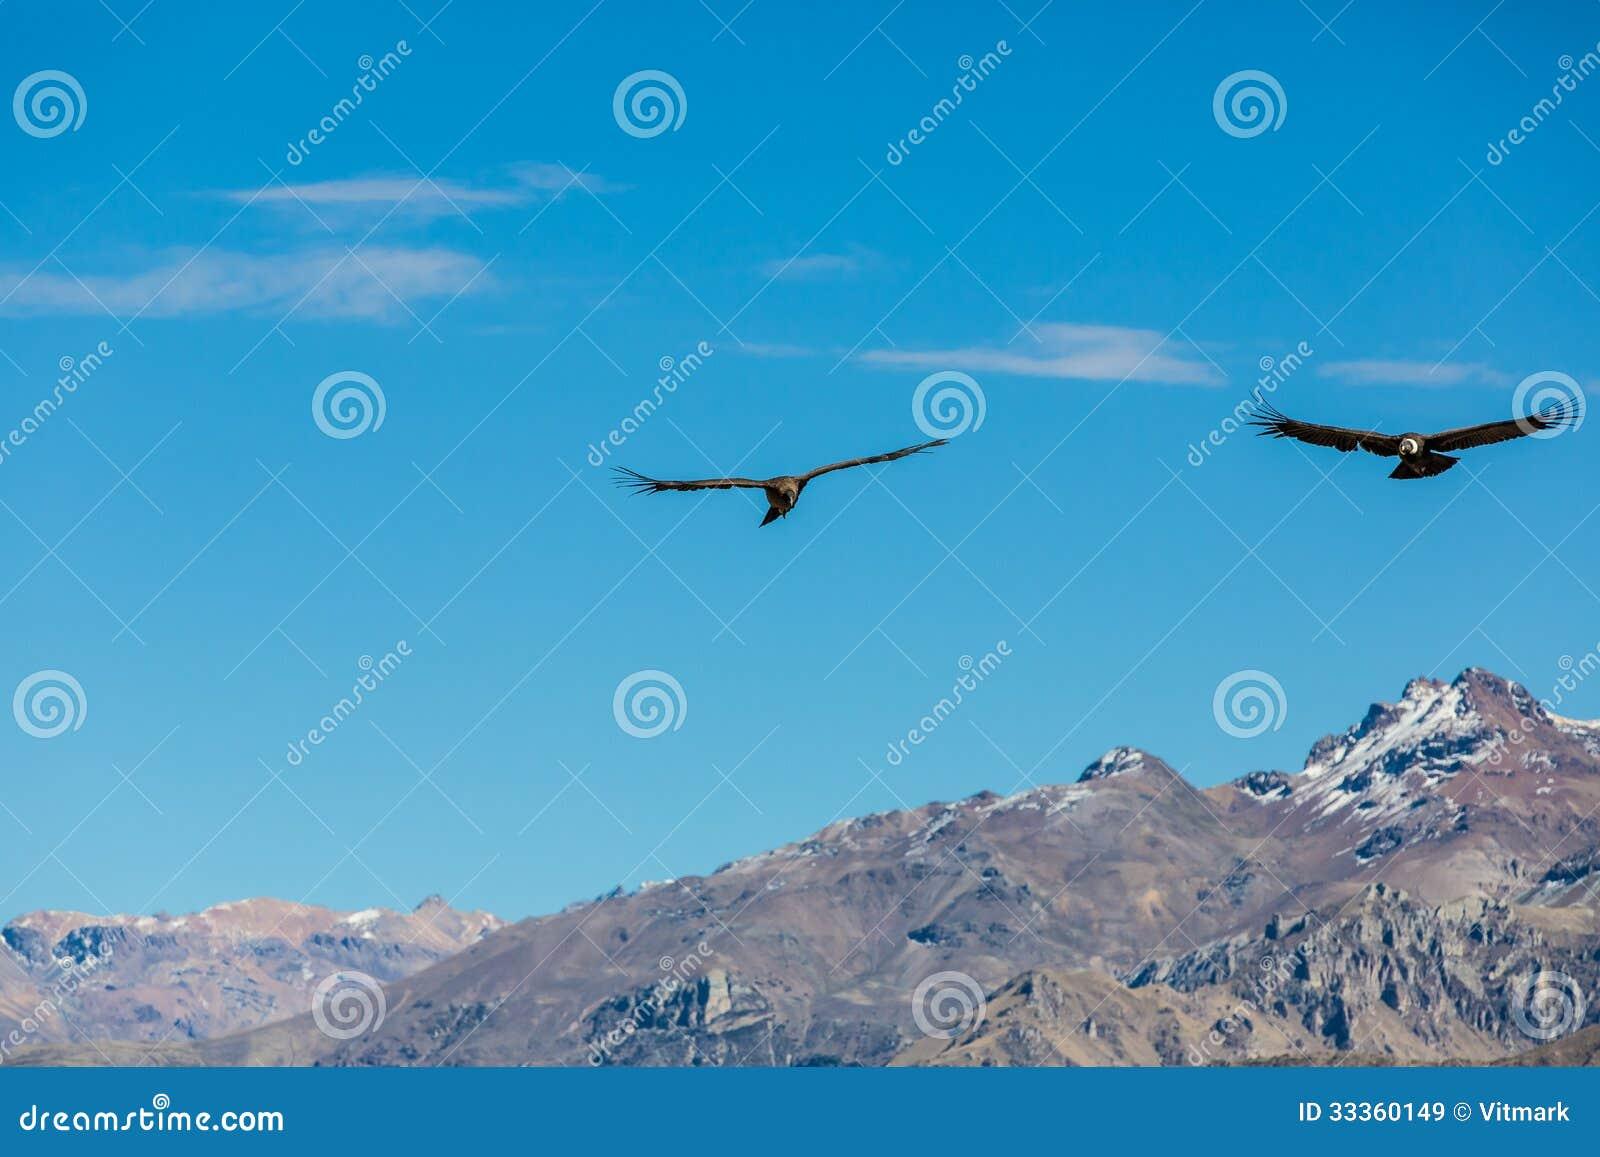 Vliegende condor over Colca-canion, Peru, Zuid-Amerika. Dit is condor de grootste vliegende vogel ter wereld